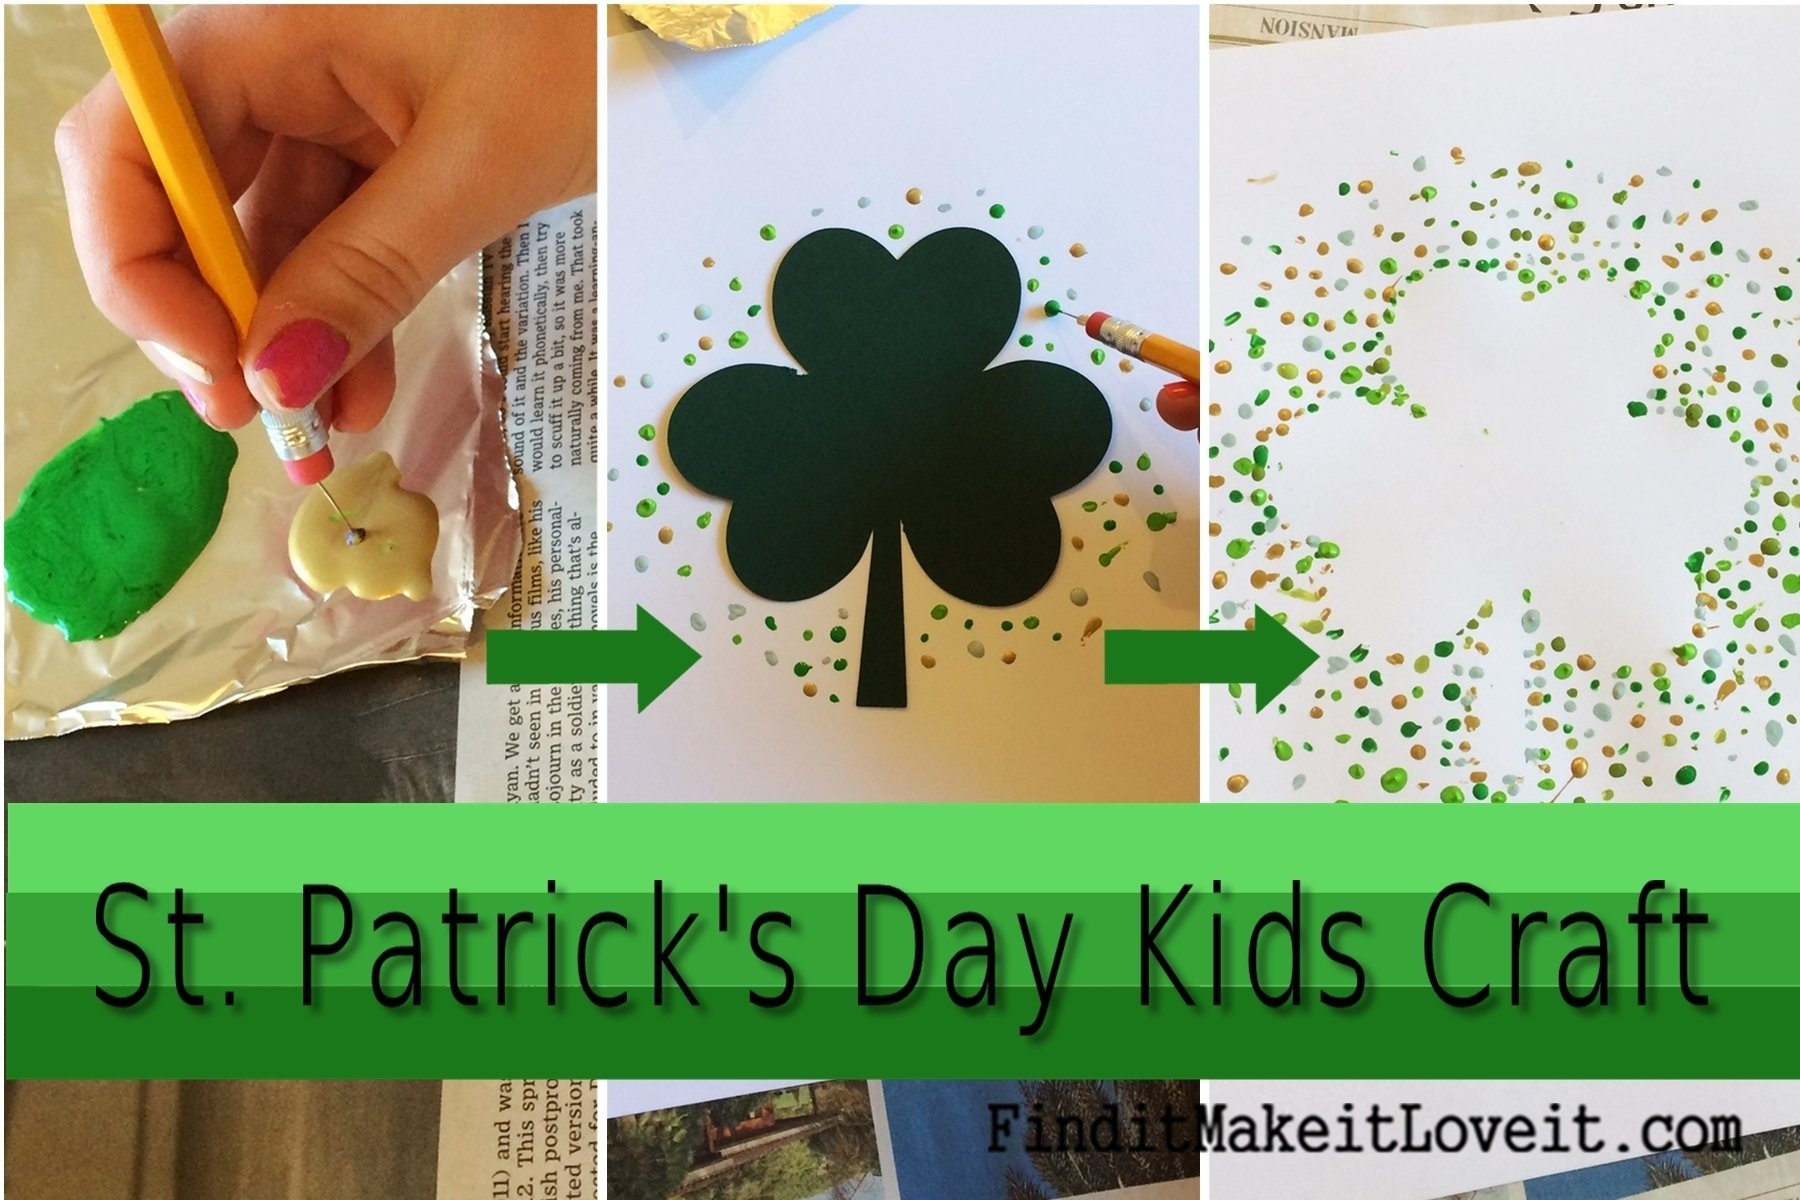 10 Lovable St Patricks Day Craft Ideas st patricks day kids craft find it make it love it 1 2020